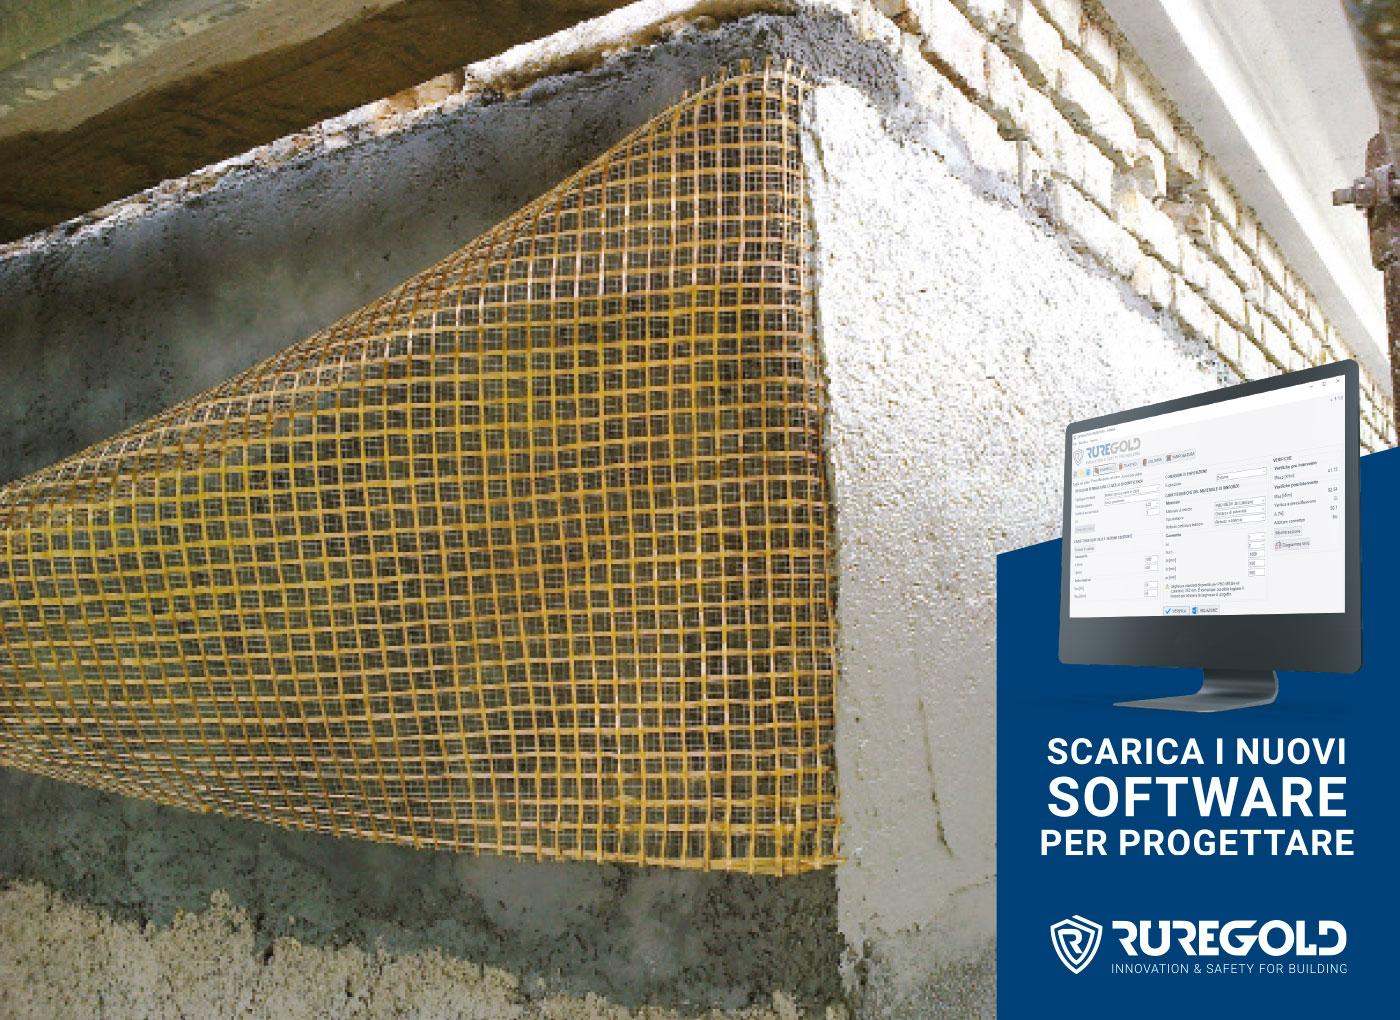 Ruregold-software-calcolo-frcm